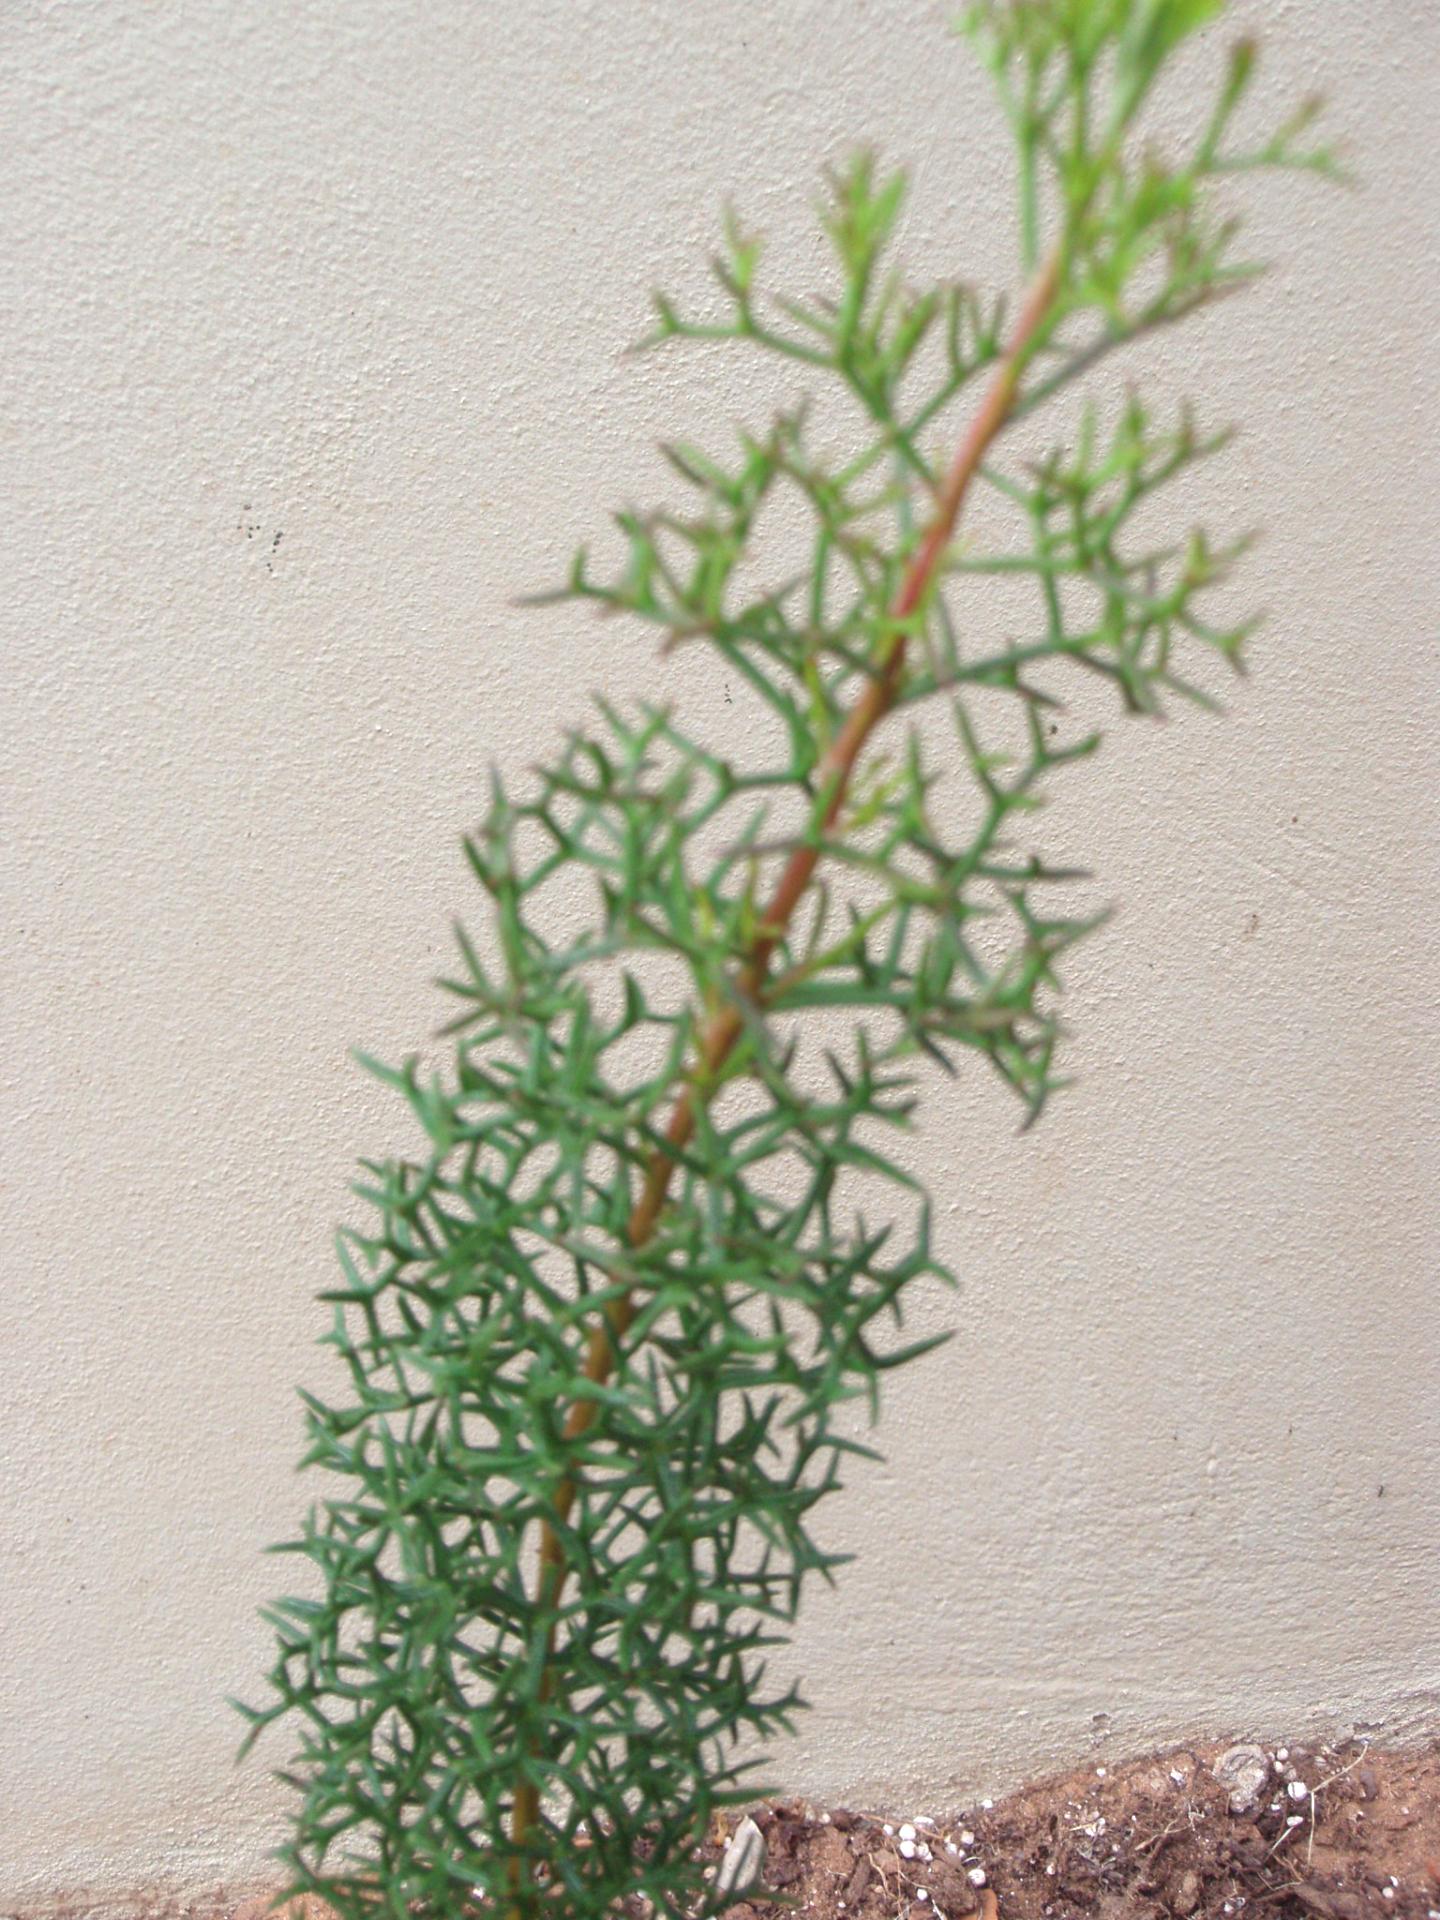 Isopogon - Curly